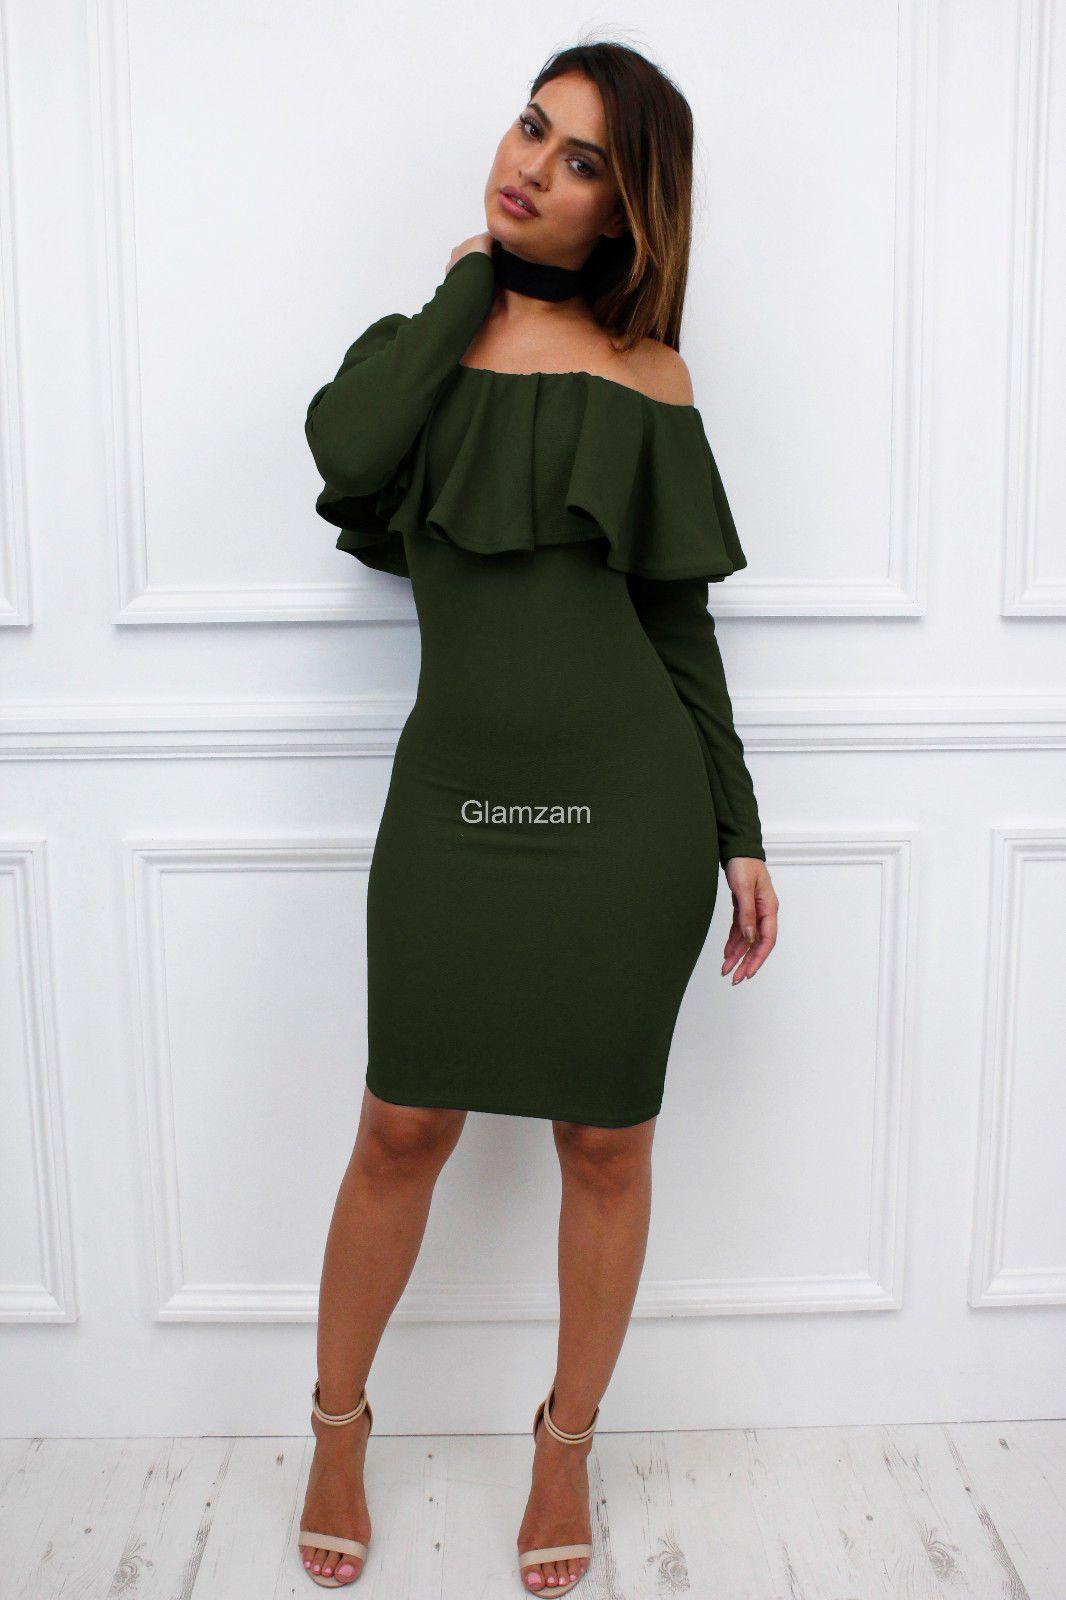 7e9e1e6e1b79 Glamzam Womens Ladies Khaki Off Shoulder Bardot Long Sleeve Frill Bodycon  Dress Long Sleeve Midi Dress